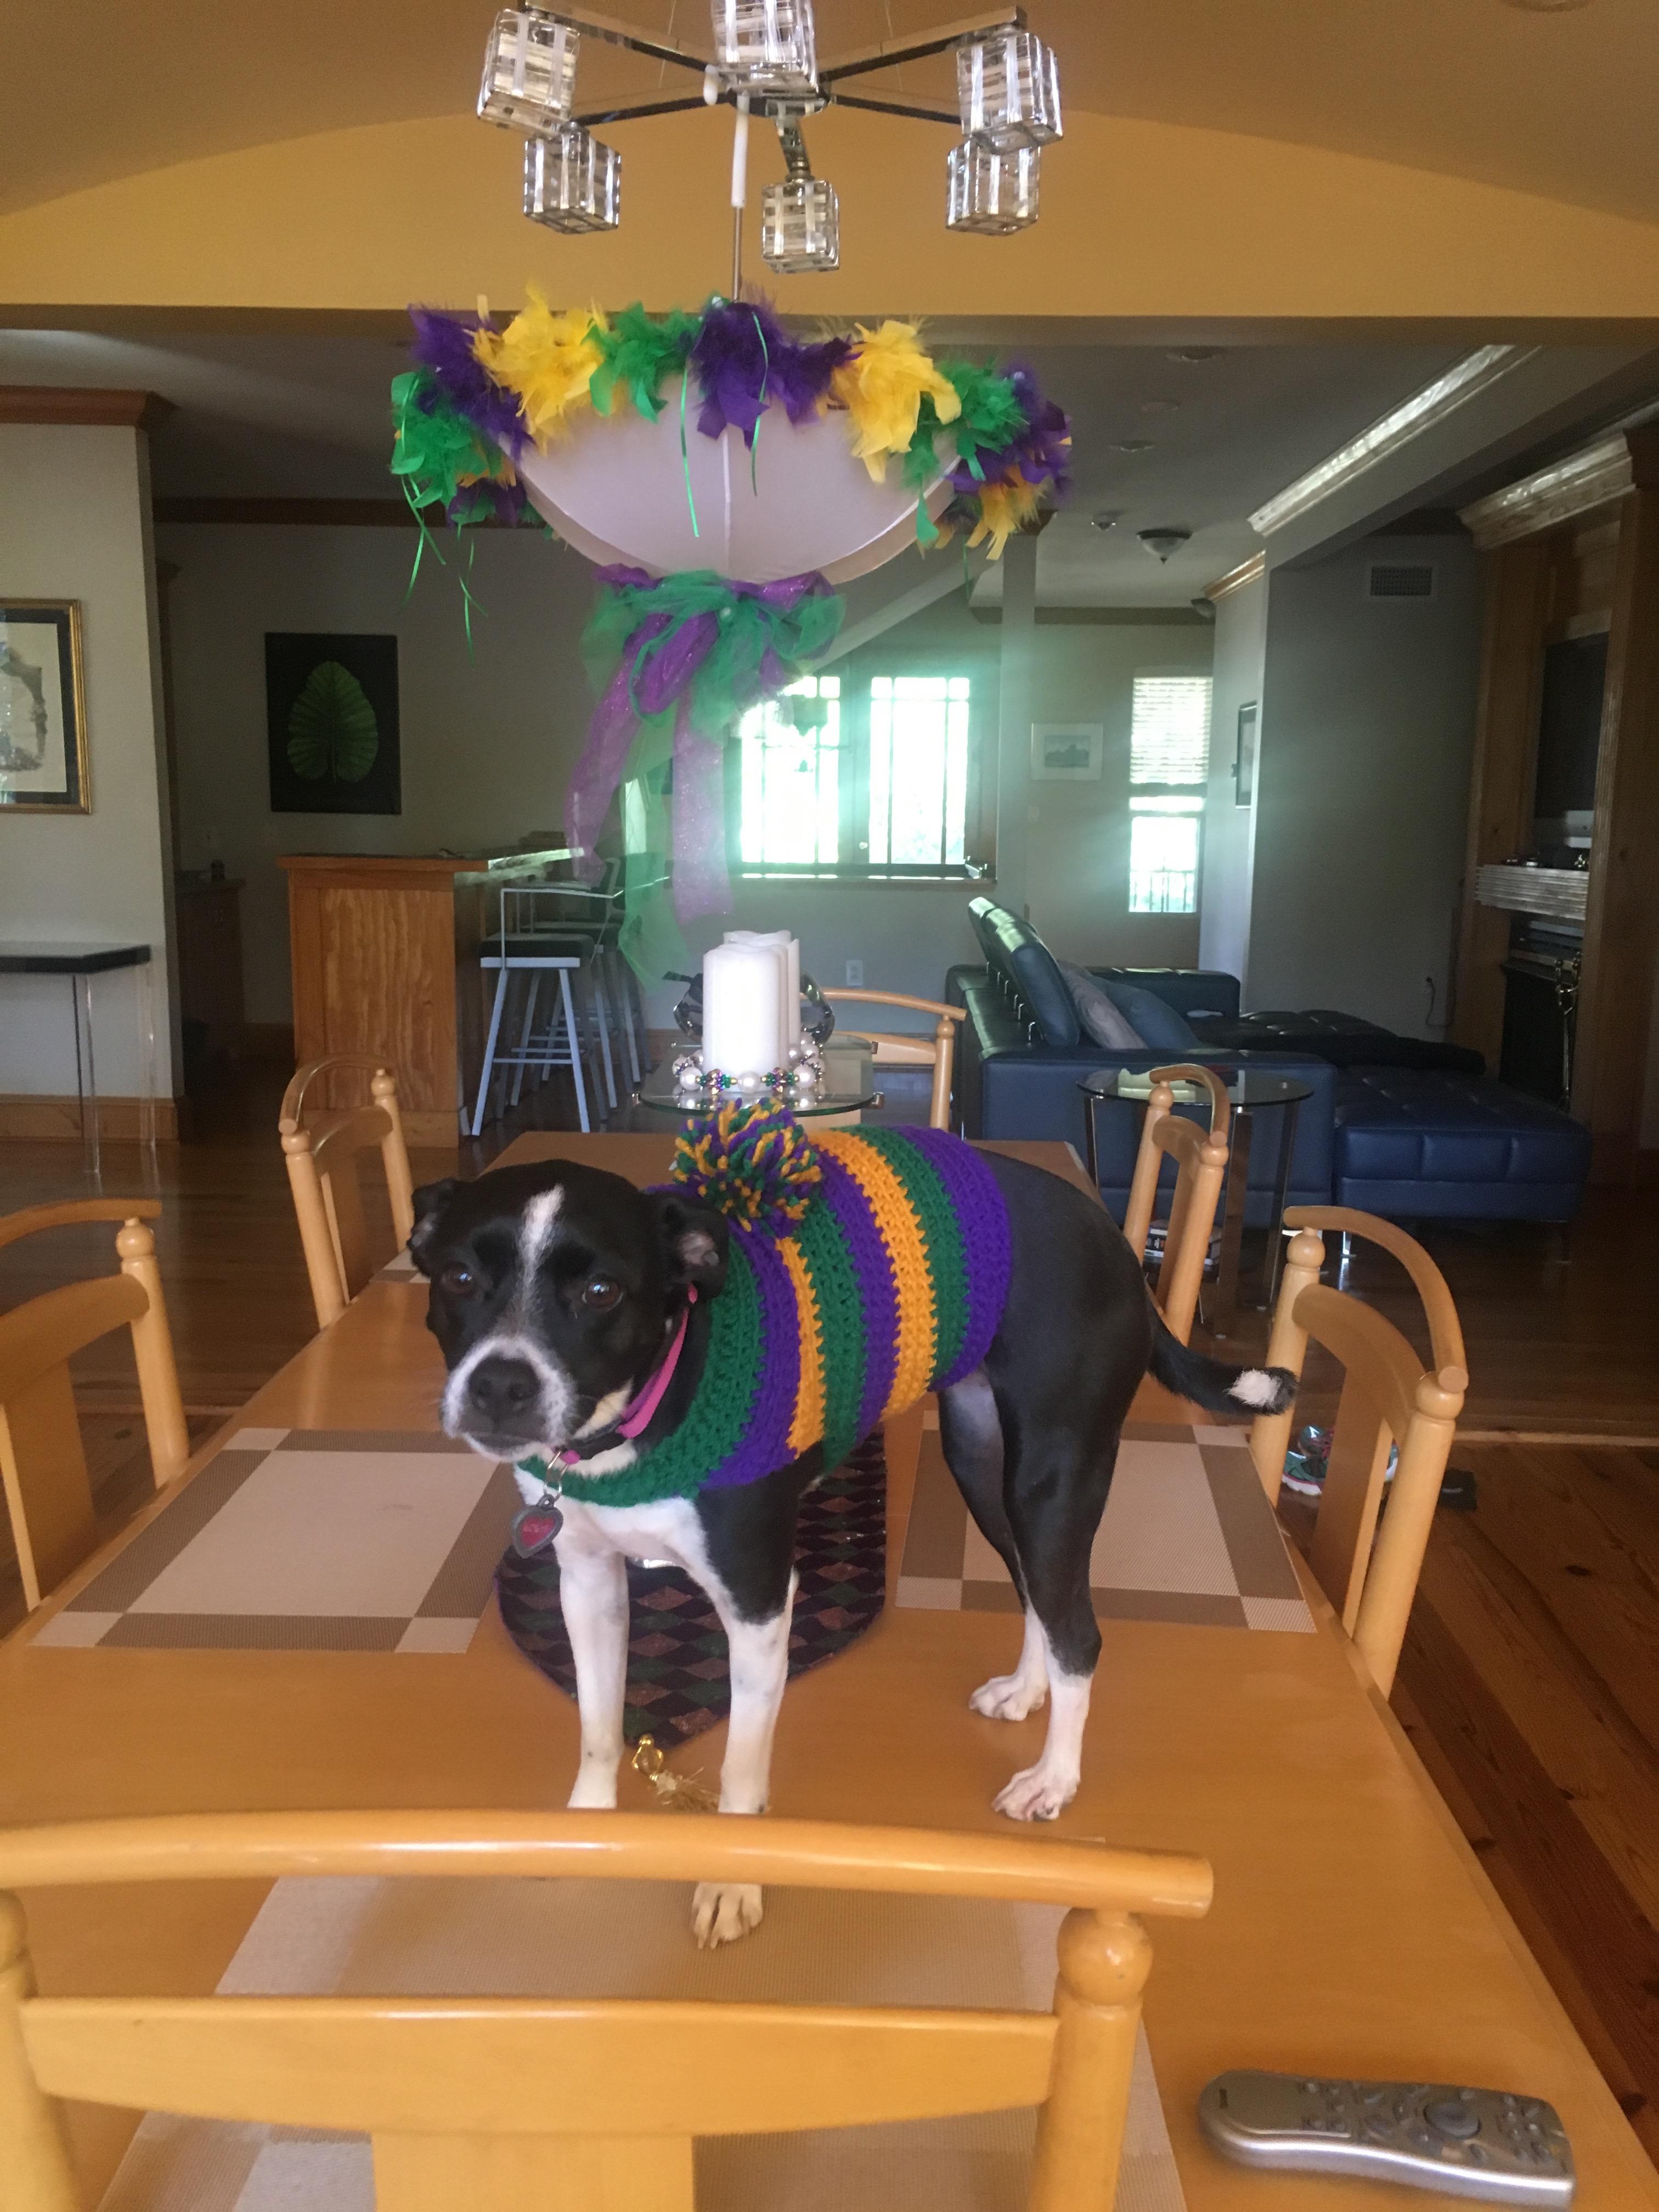 Dressing up your dog Mardi Gras